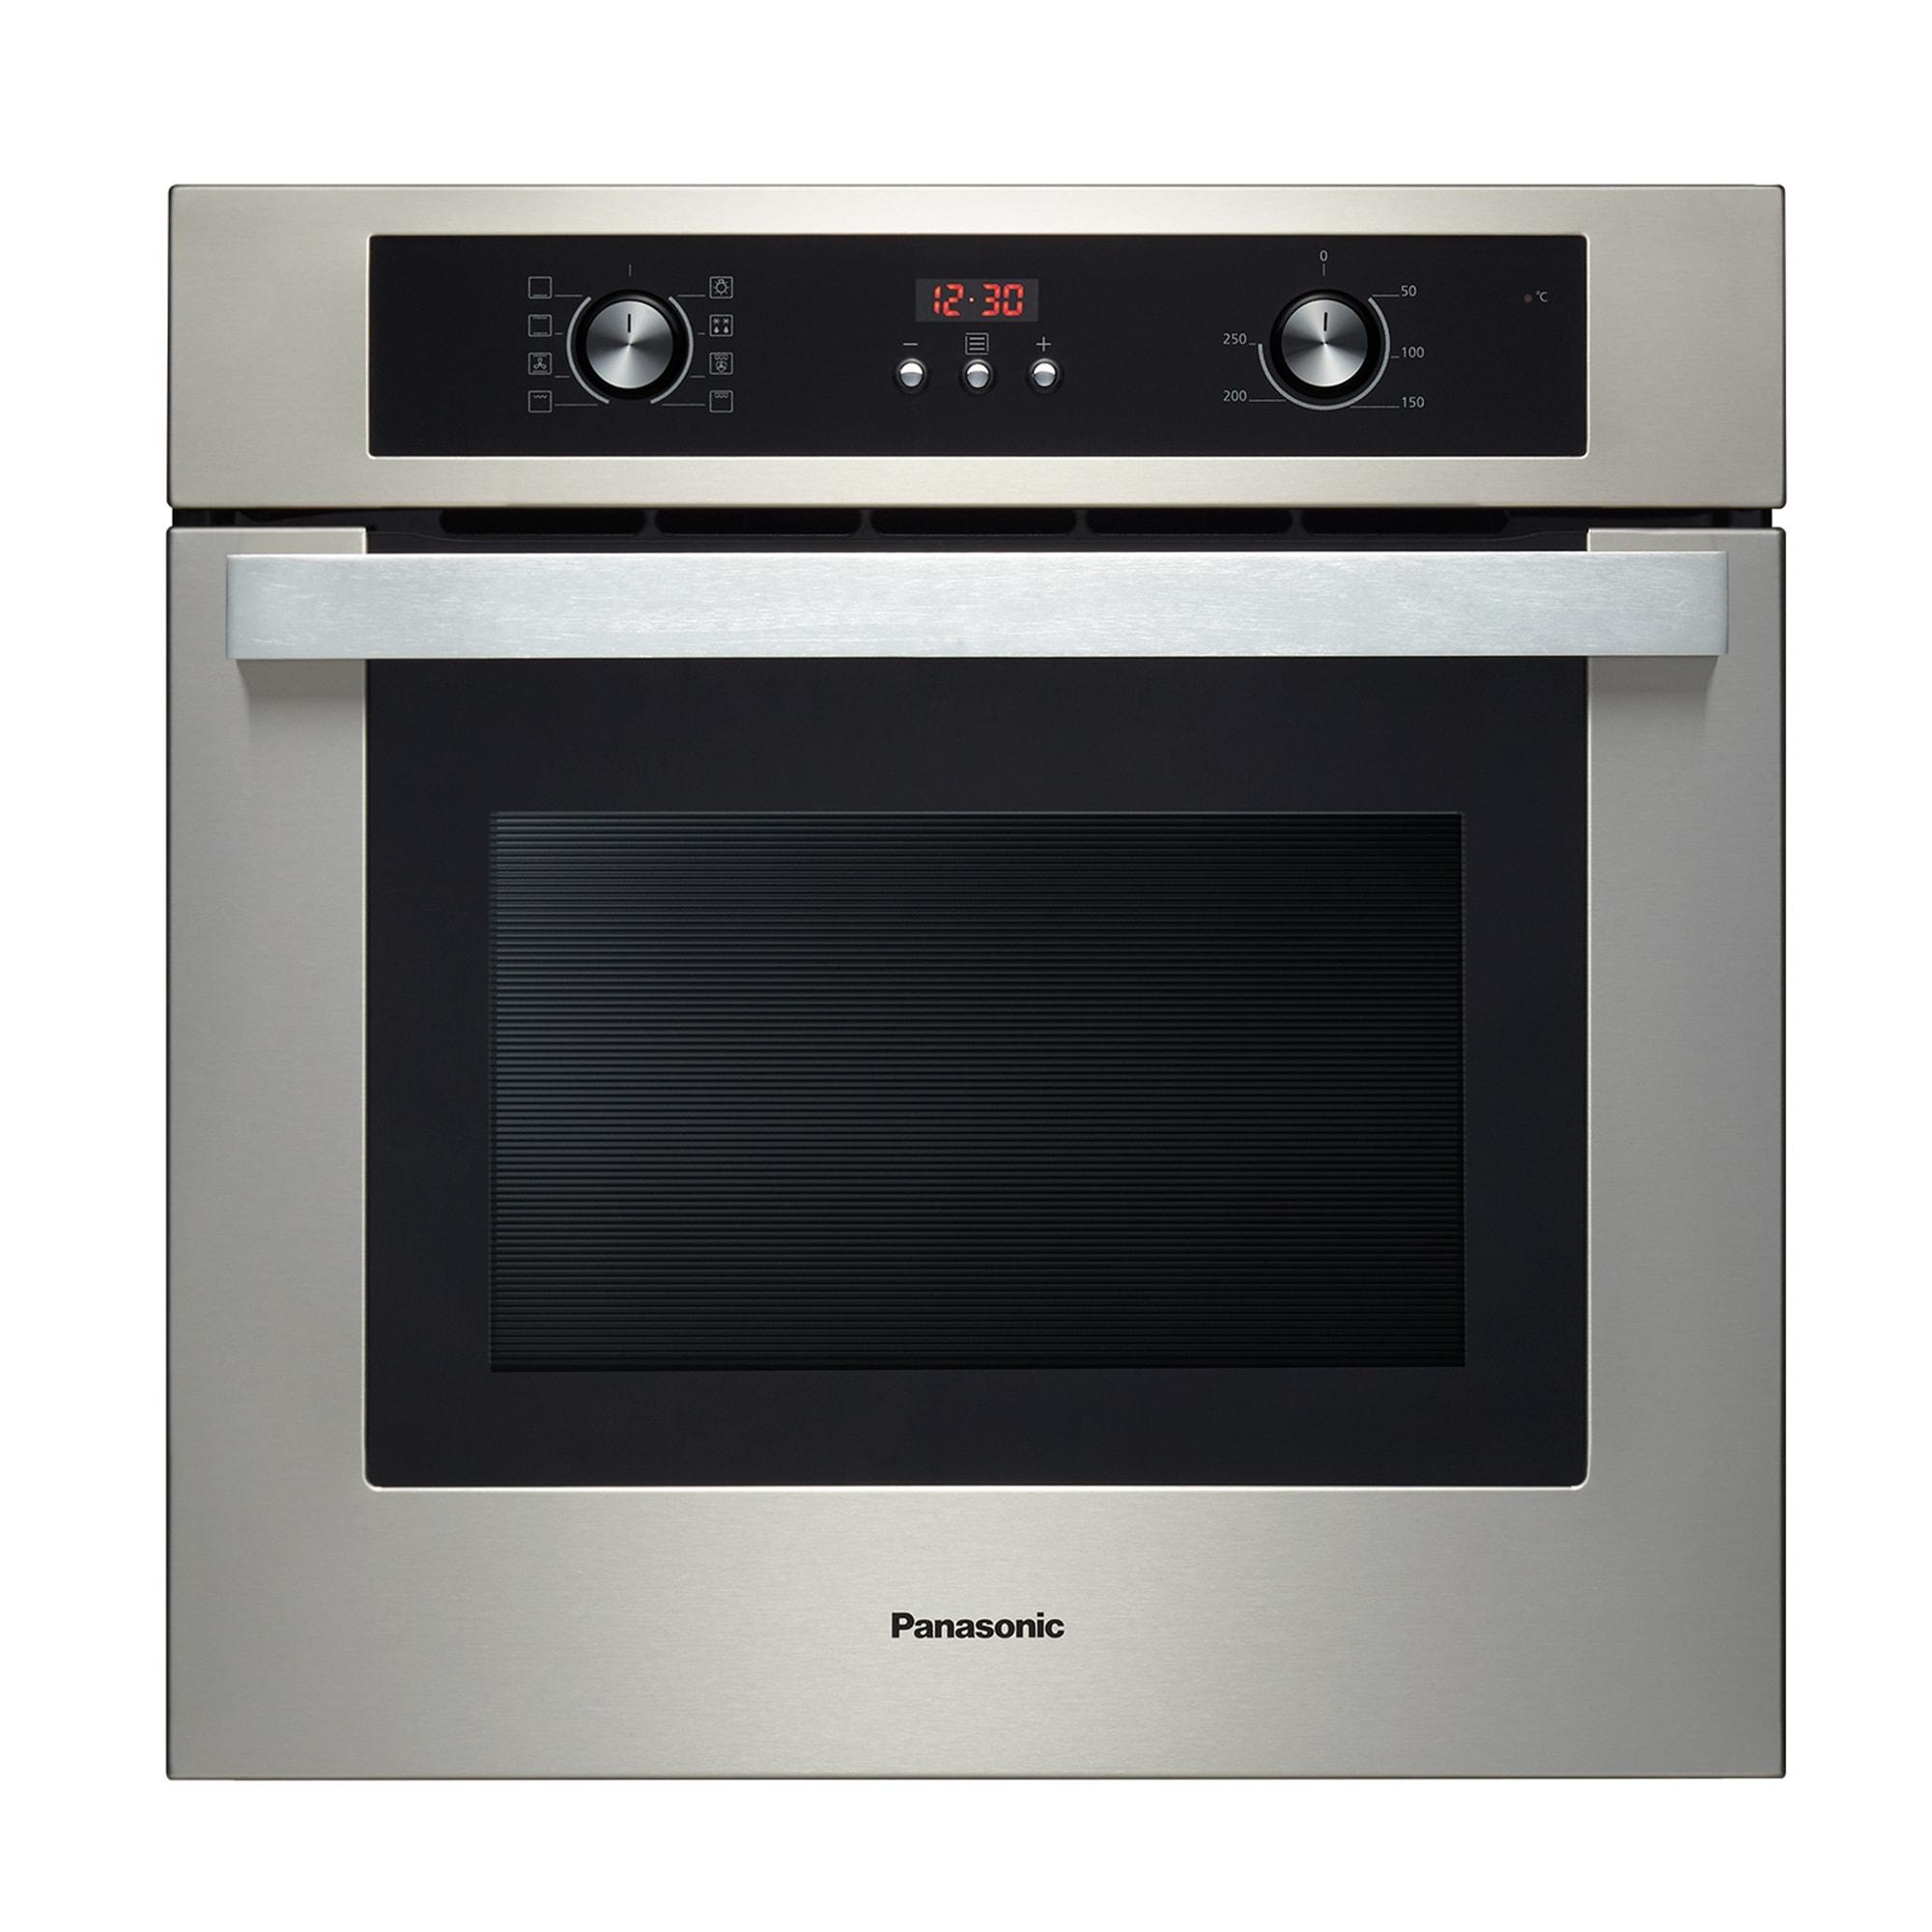 Panasonic Built In Oven Hl Fn645s 70l 7 Auto Pre